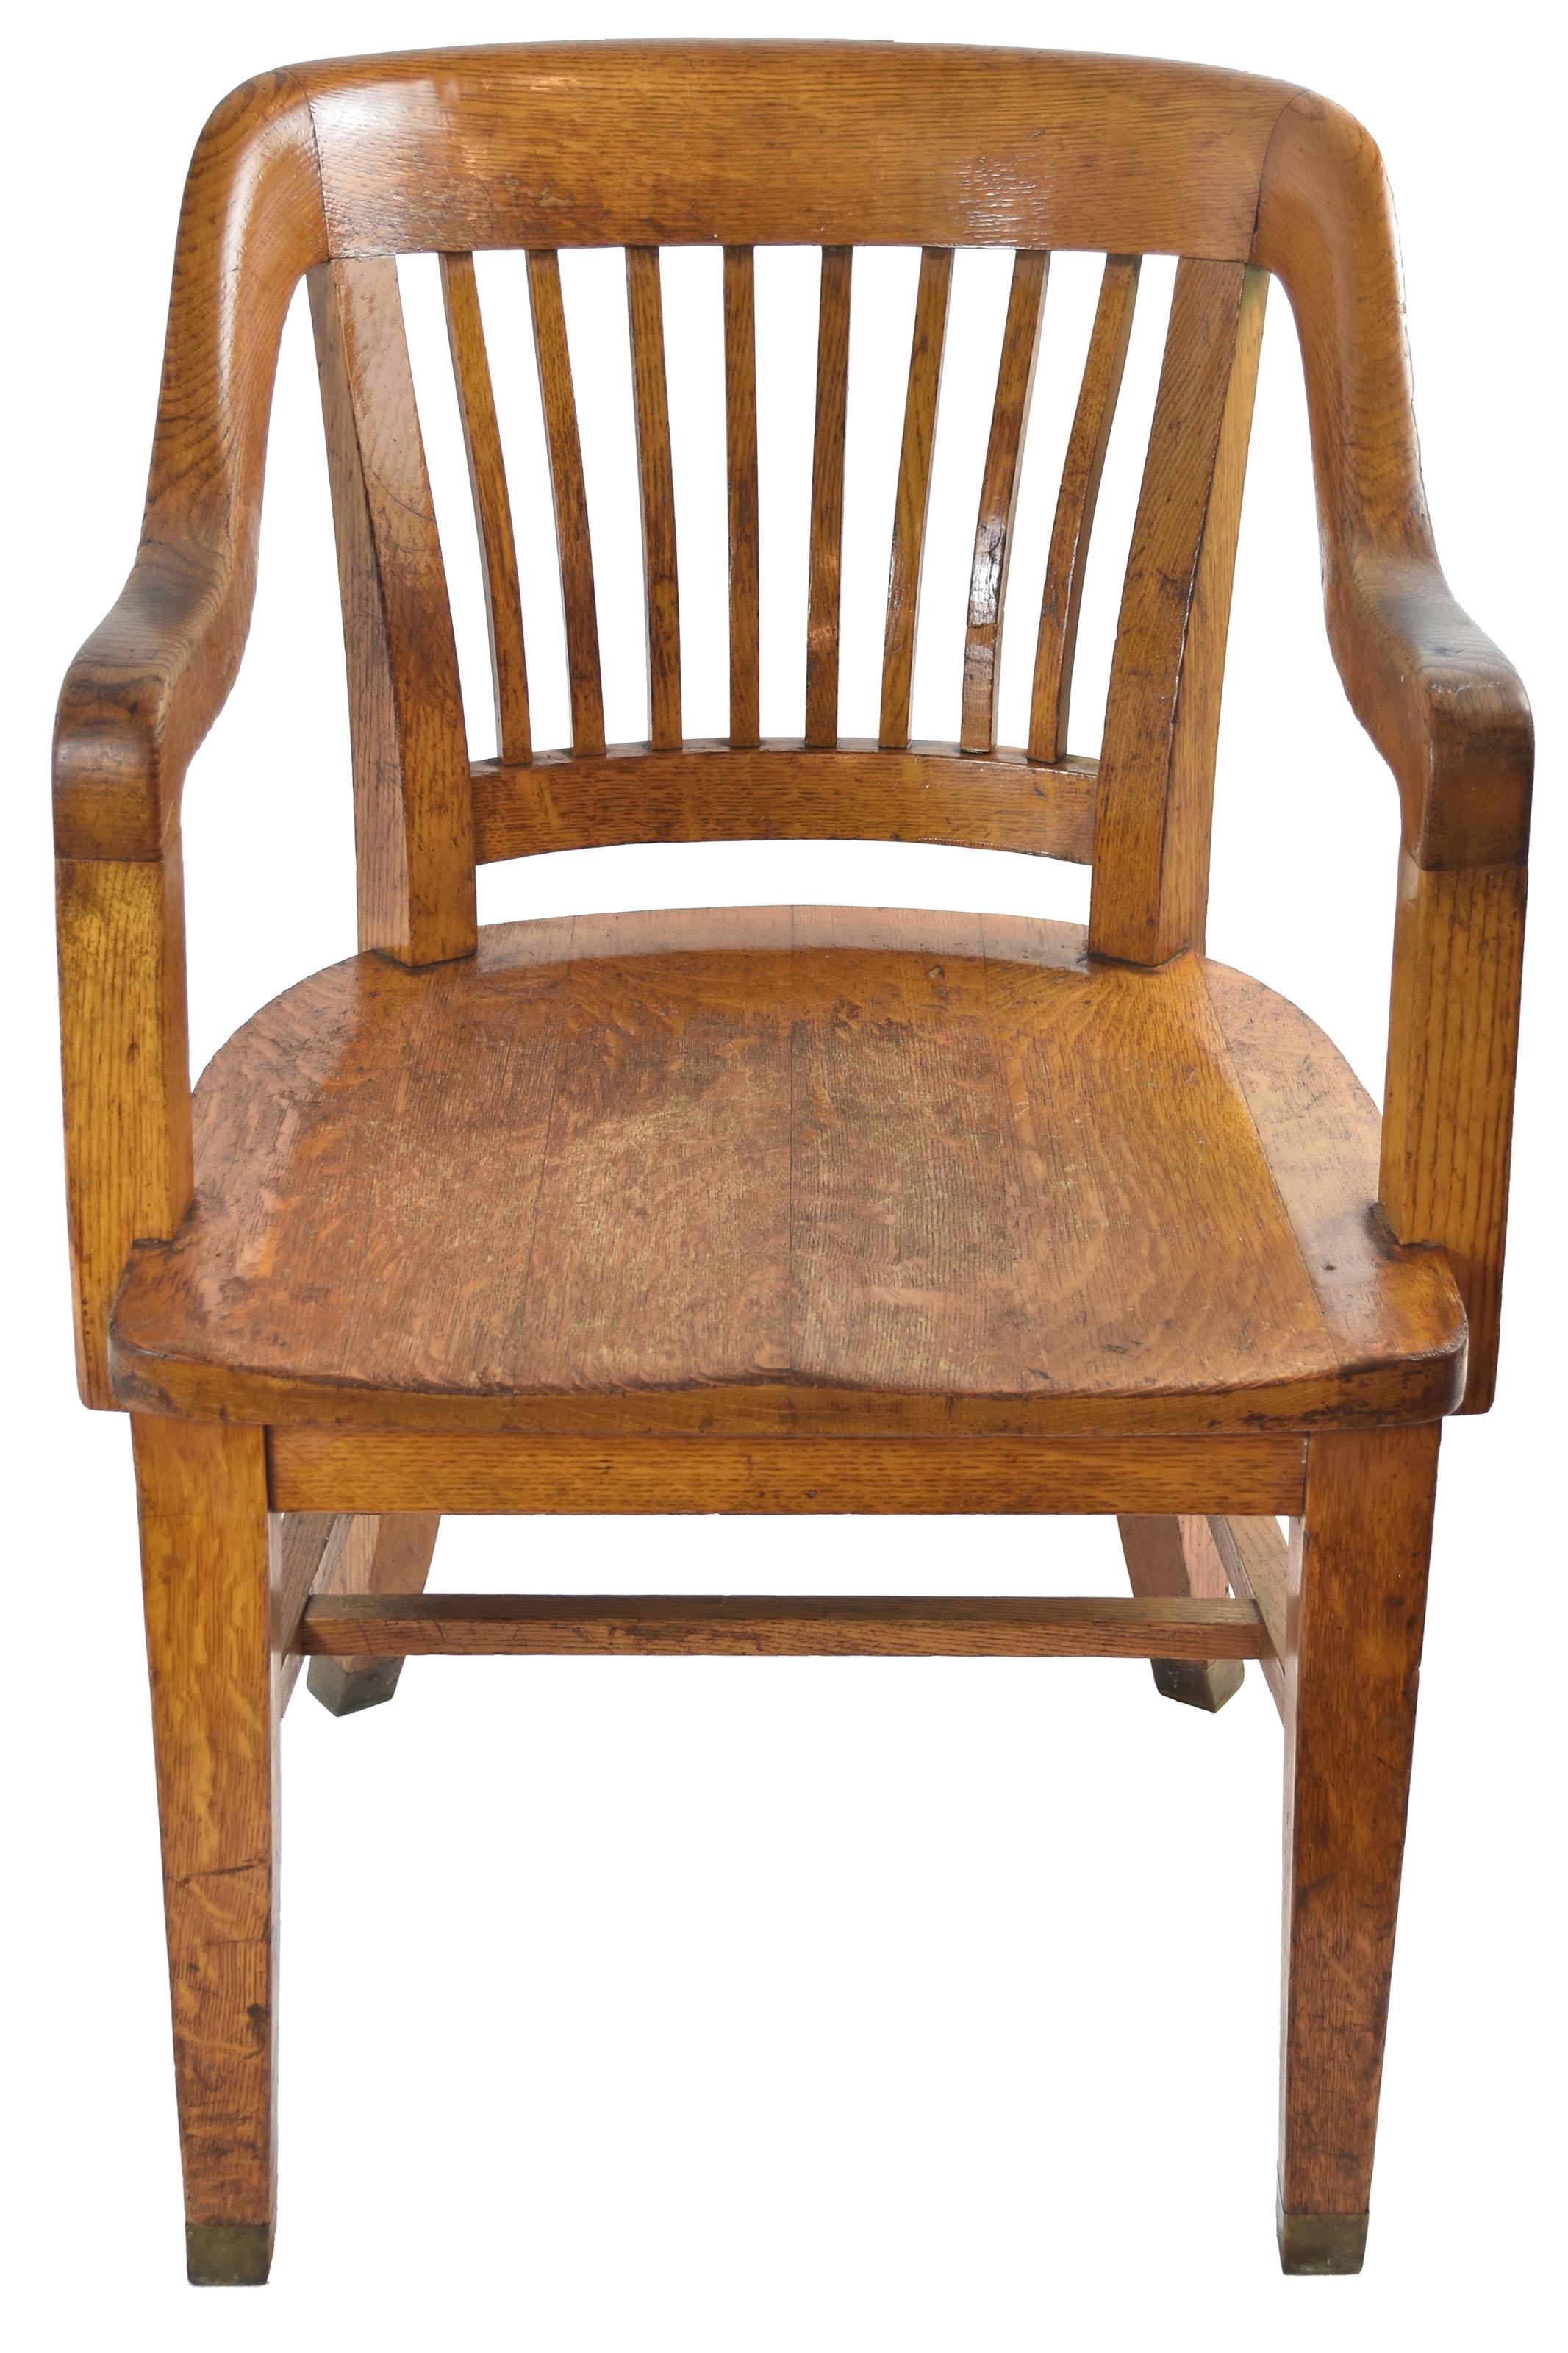 47978 courtroom oak chairs 3.jpg